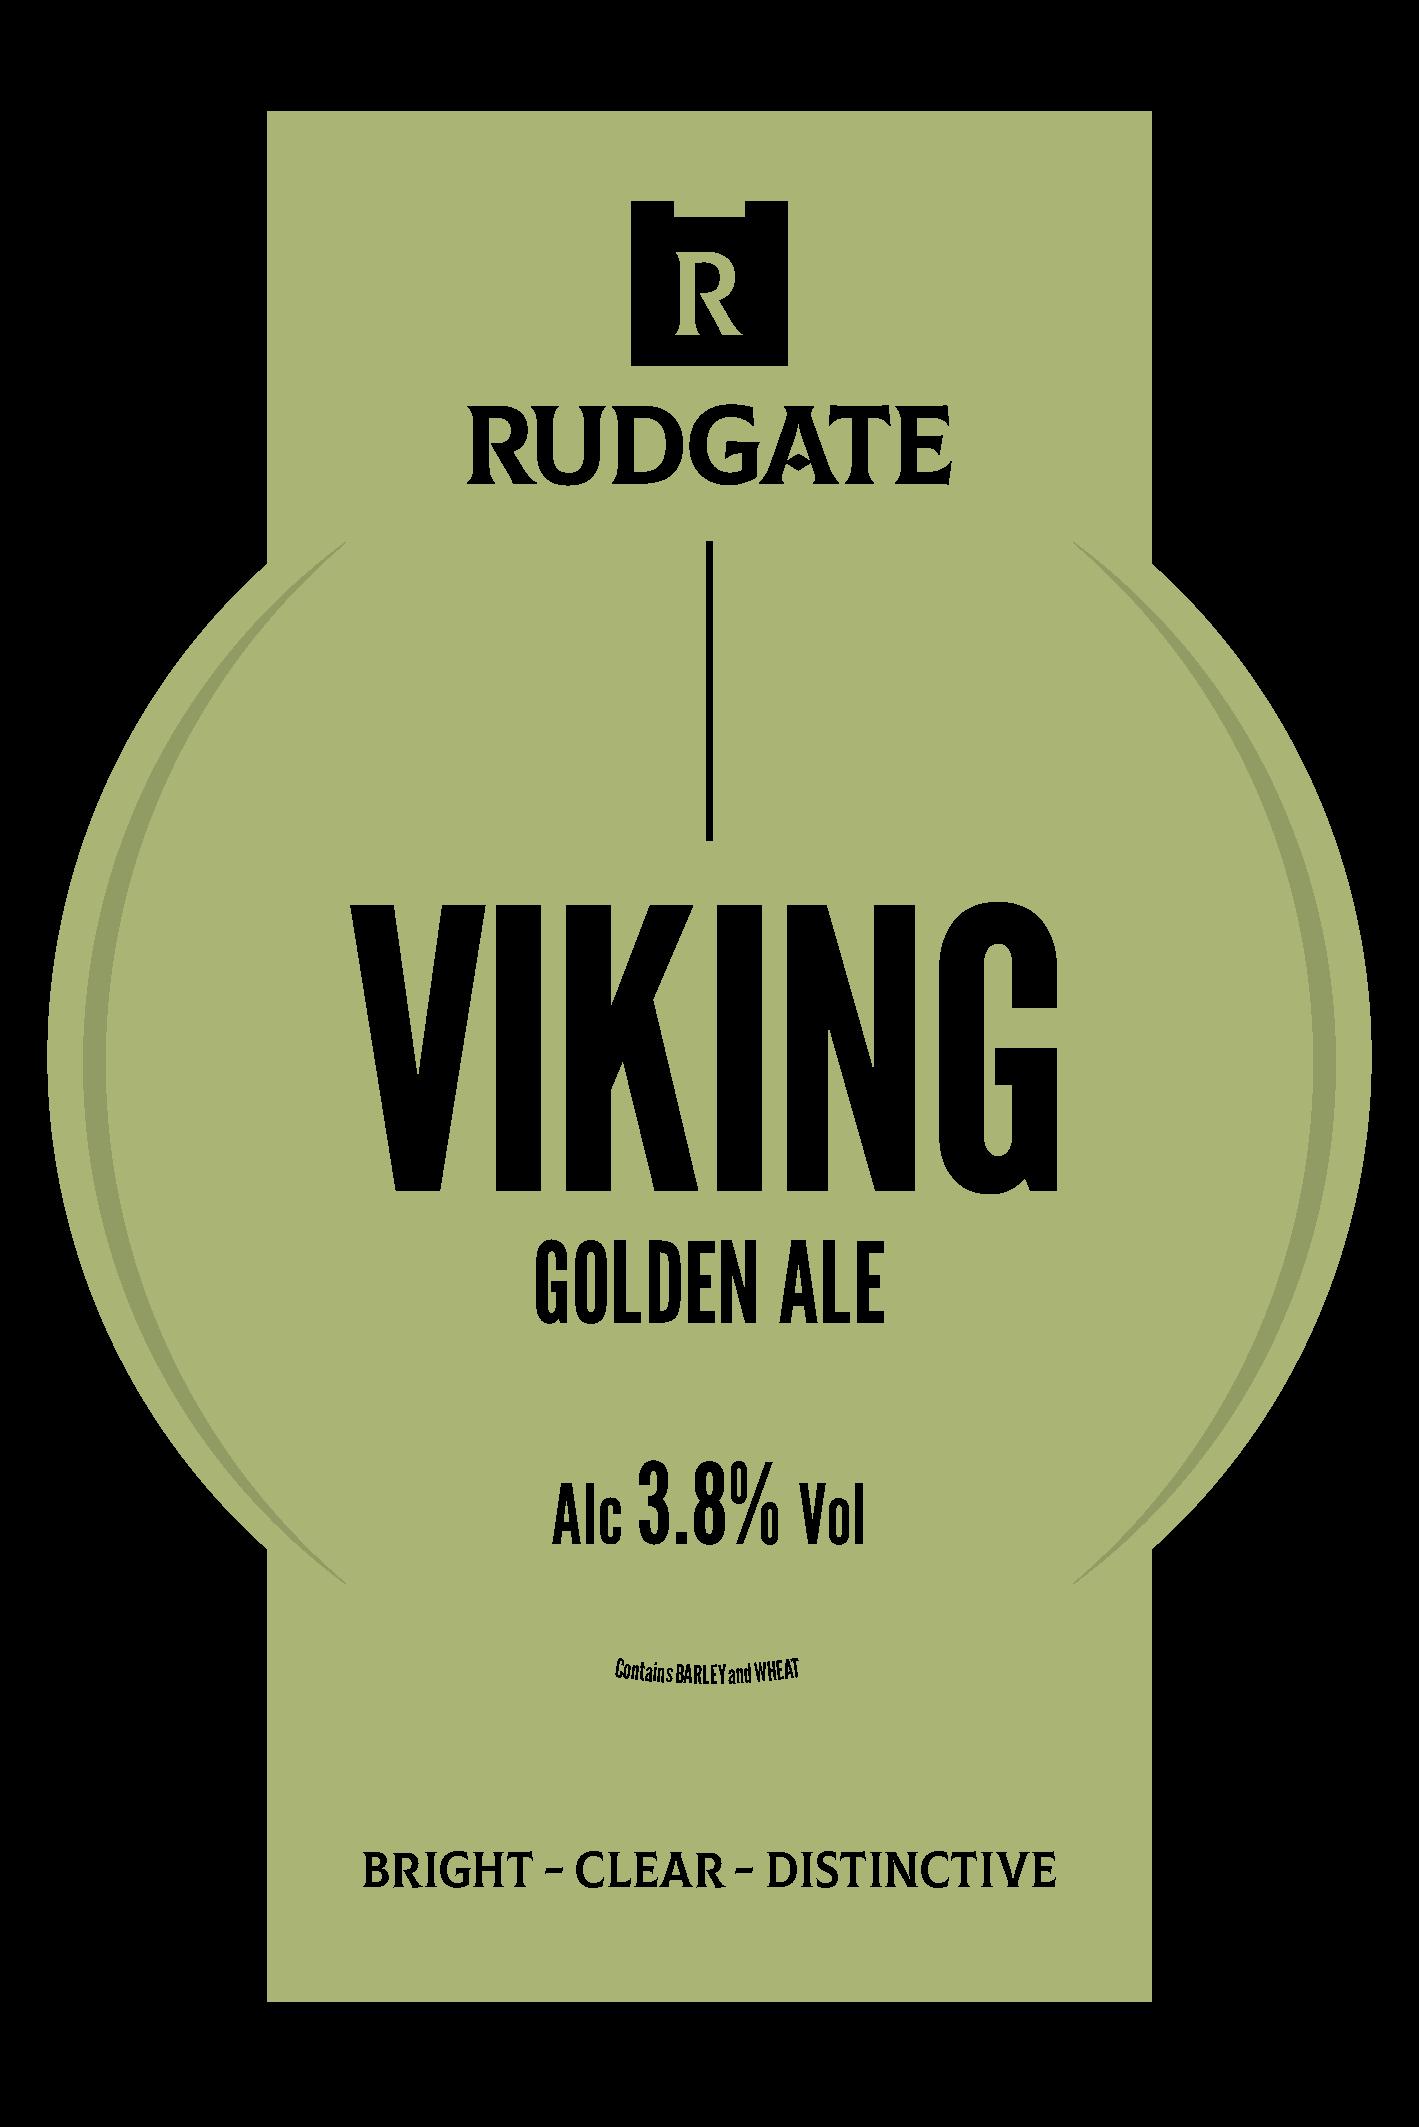 Rudgate Viking 9 Gallons Golden   3.8%